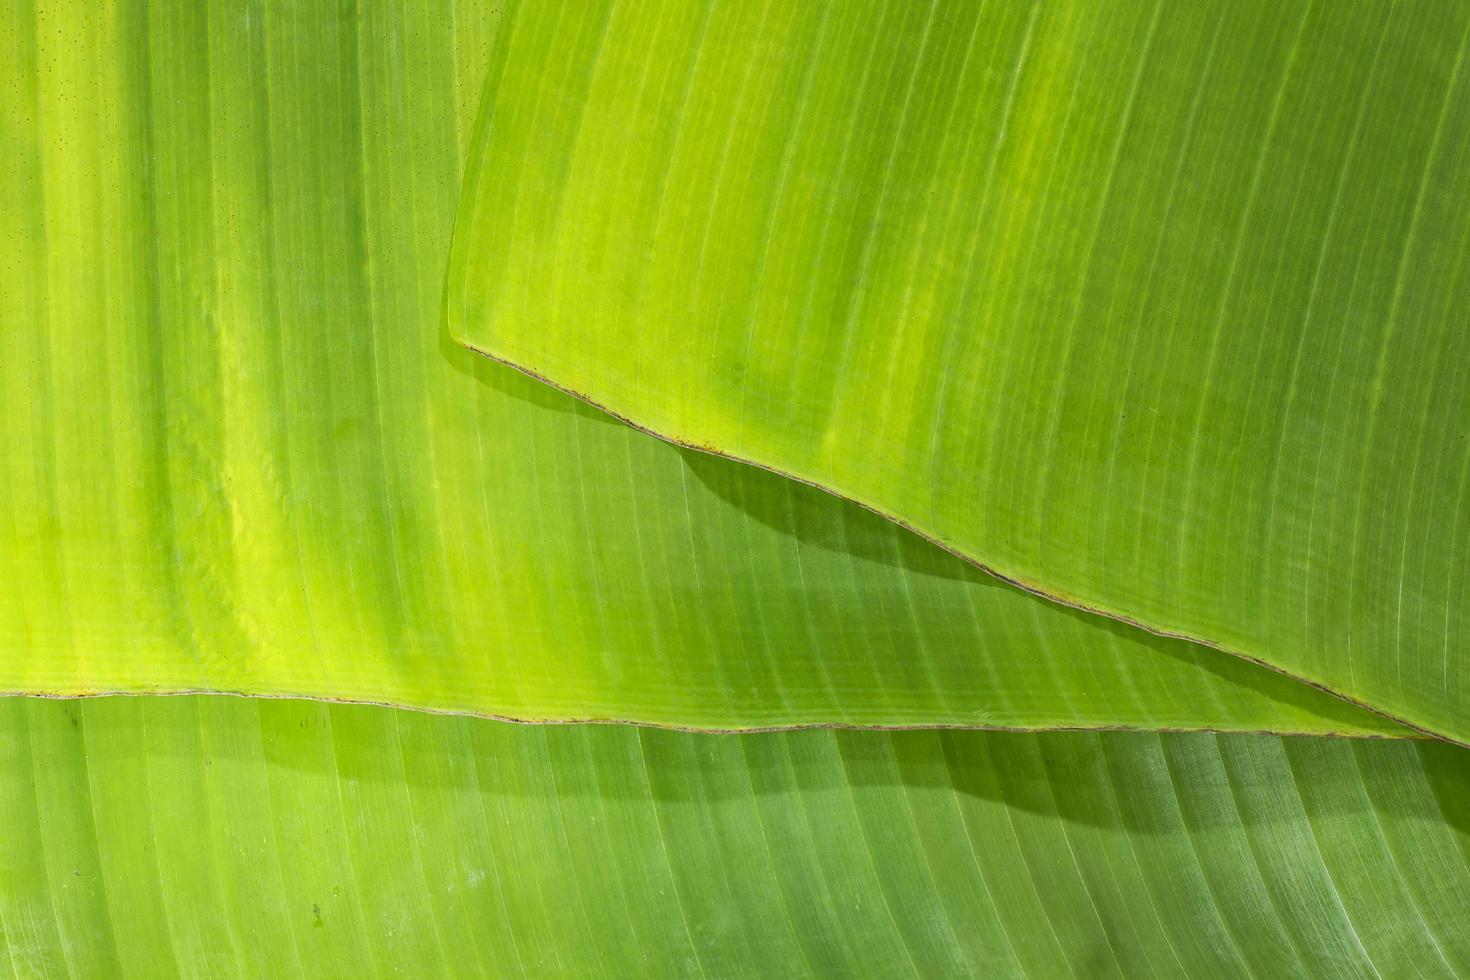 groene bananenbladtextuur foto